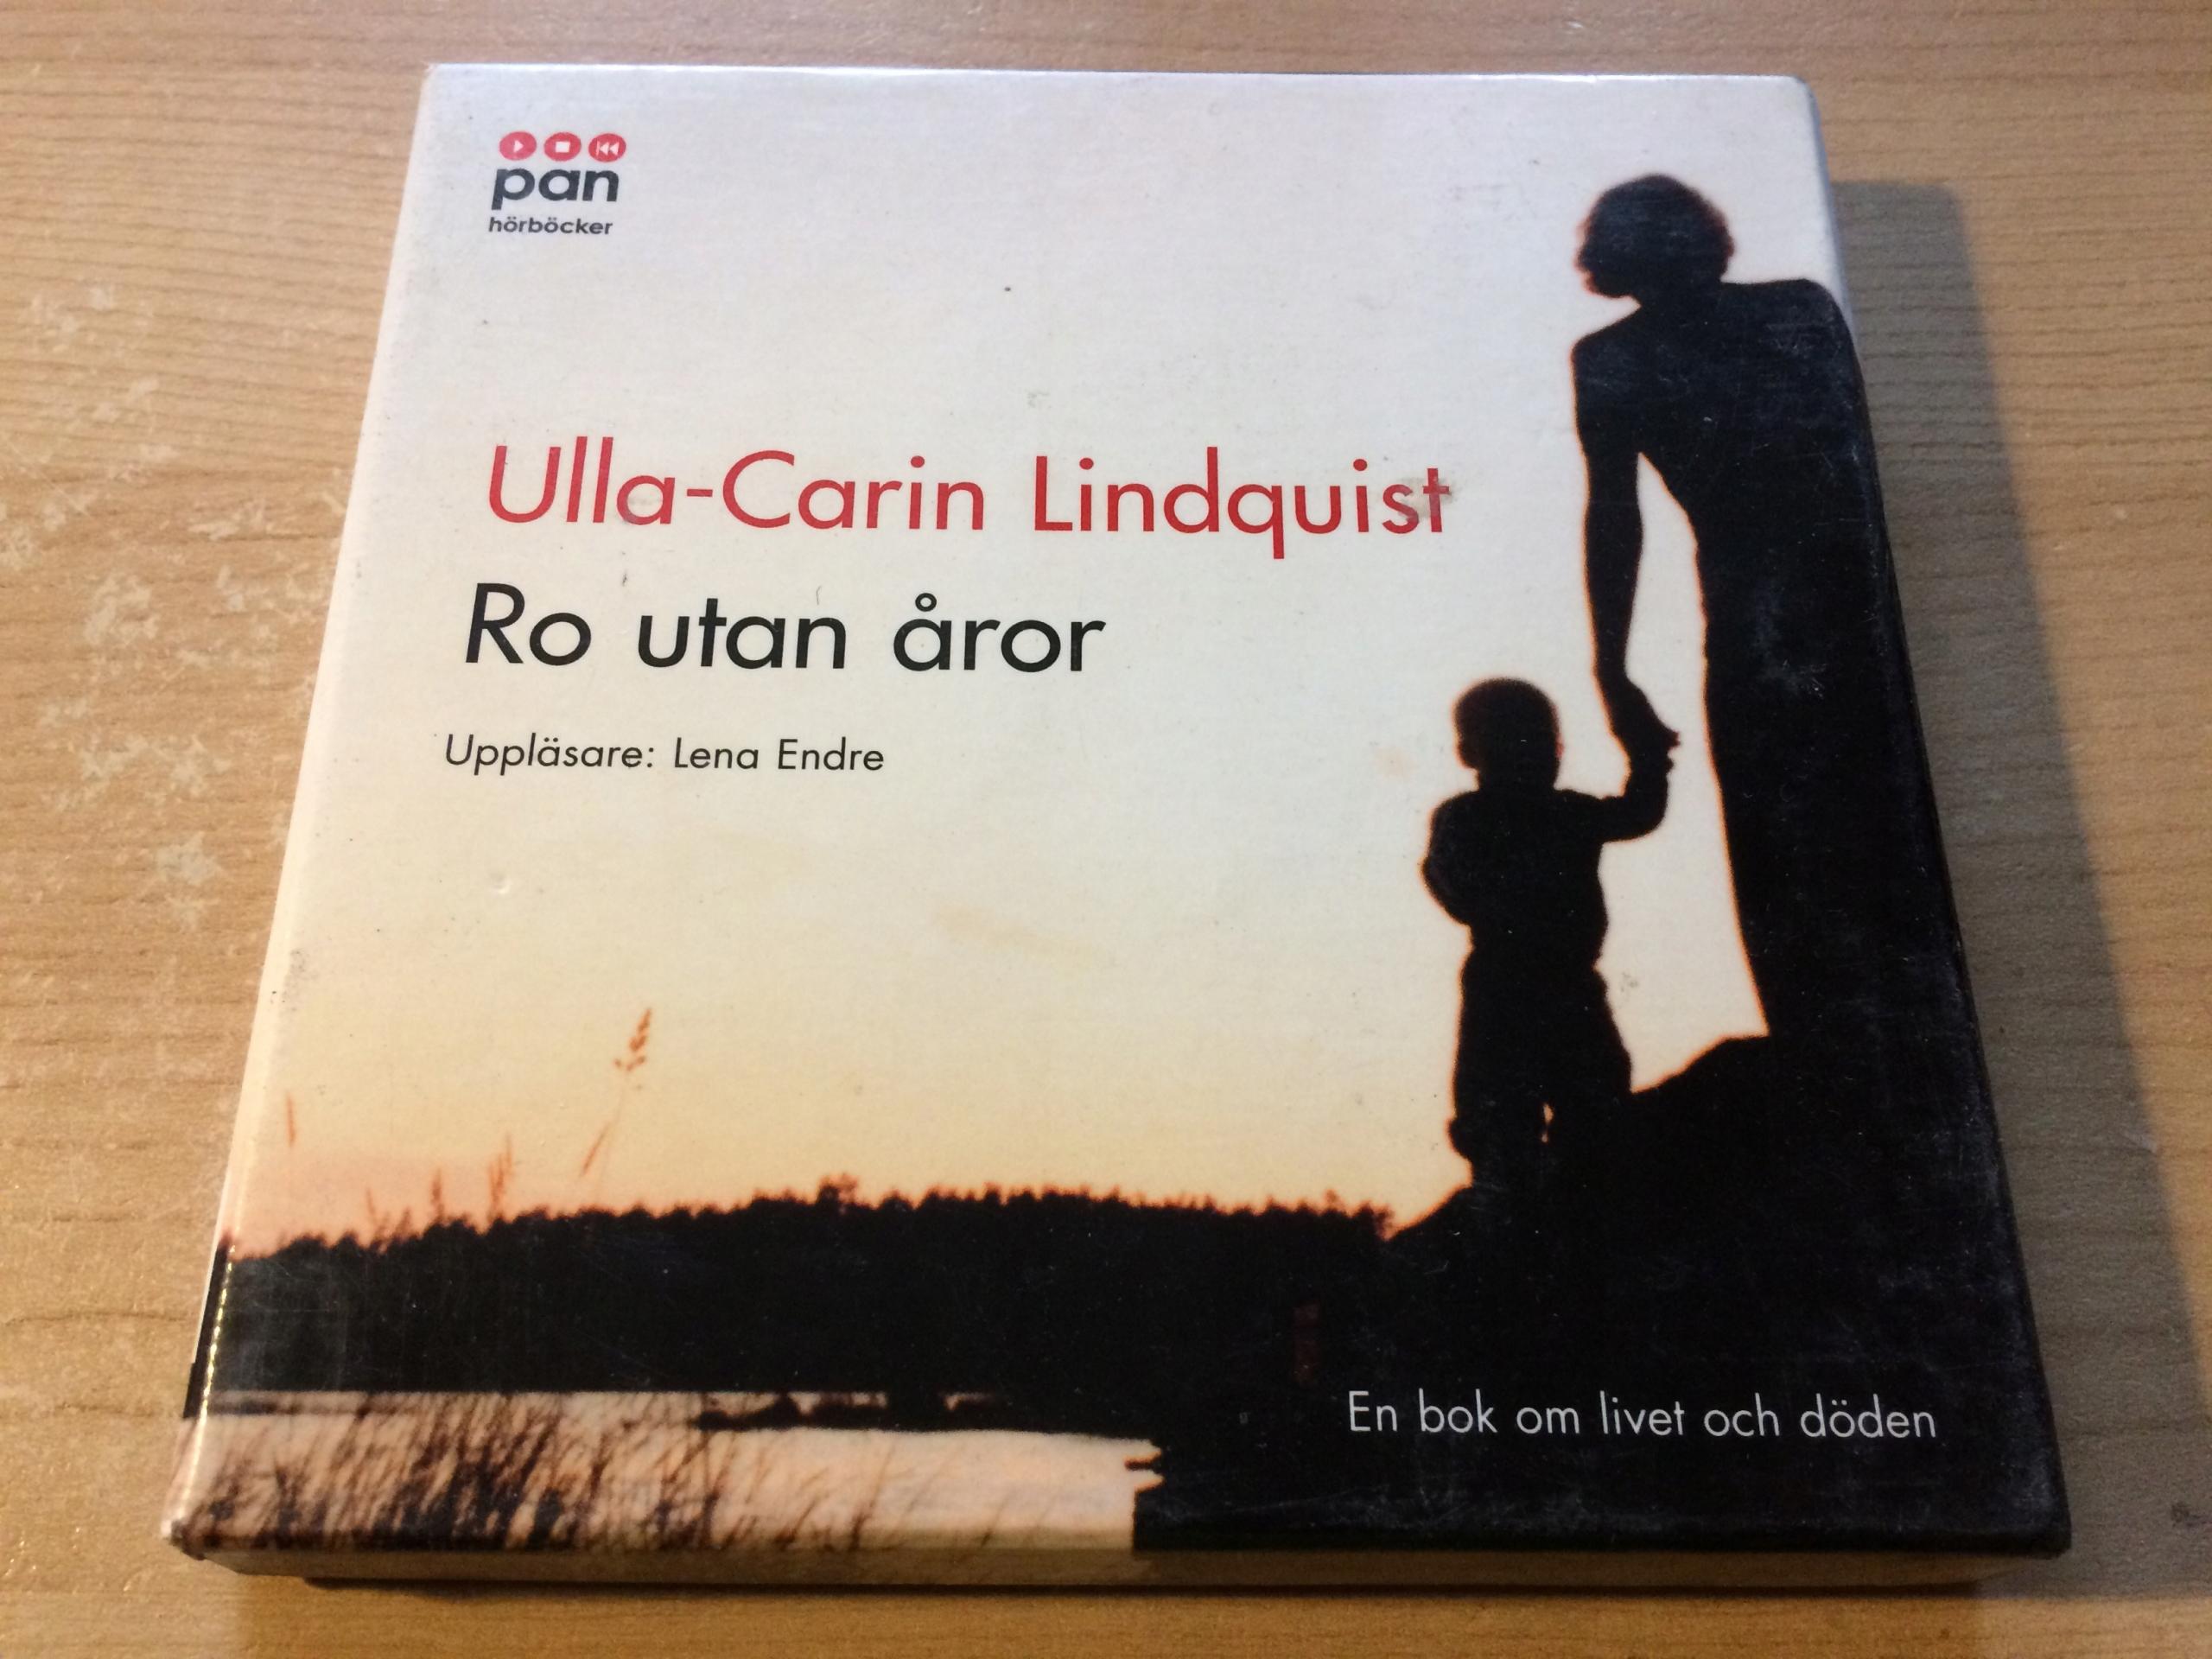 ULLA-CARIN LINDQUIST RO UTAN AROR